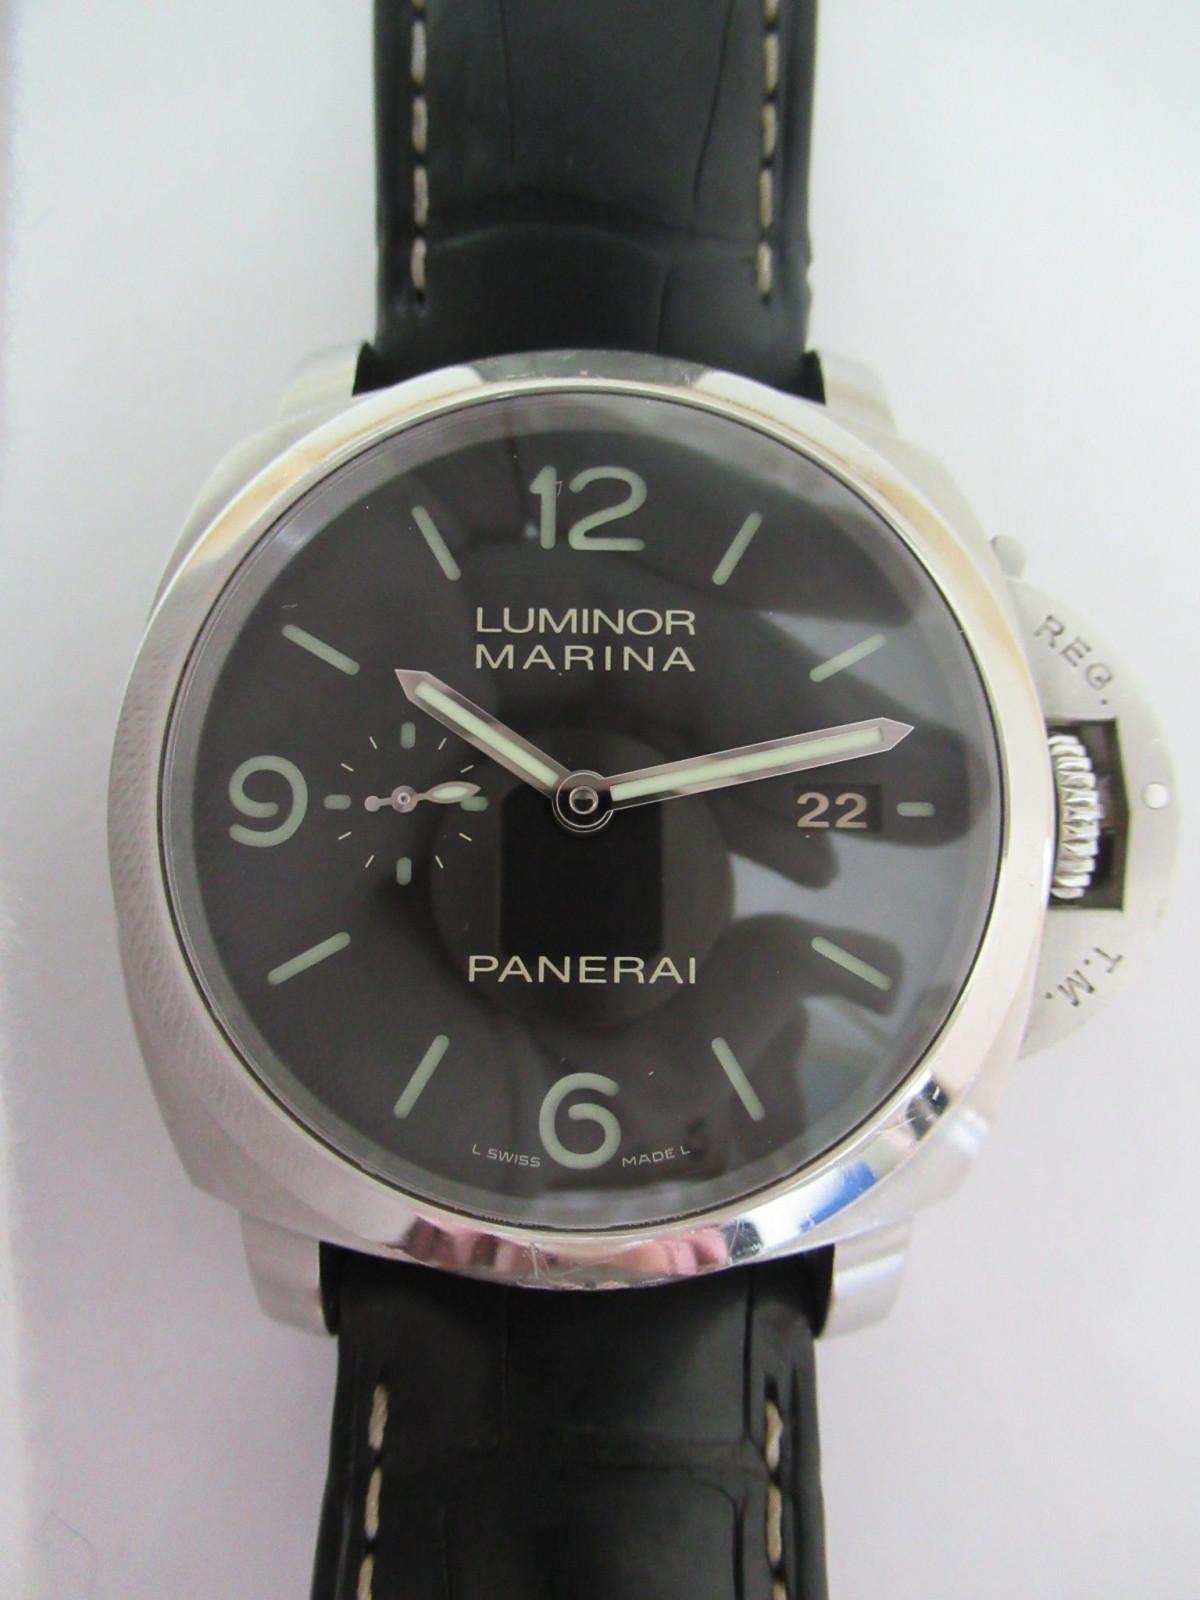 5a11d7ebb34 Panerai Luminor marina PAM00312 relógio usados (€1